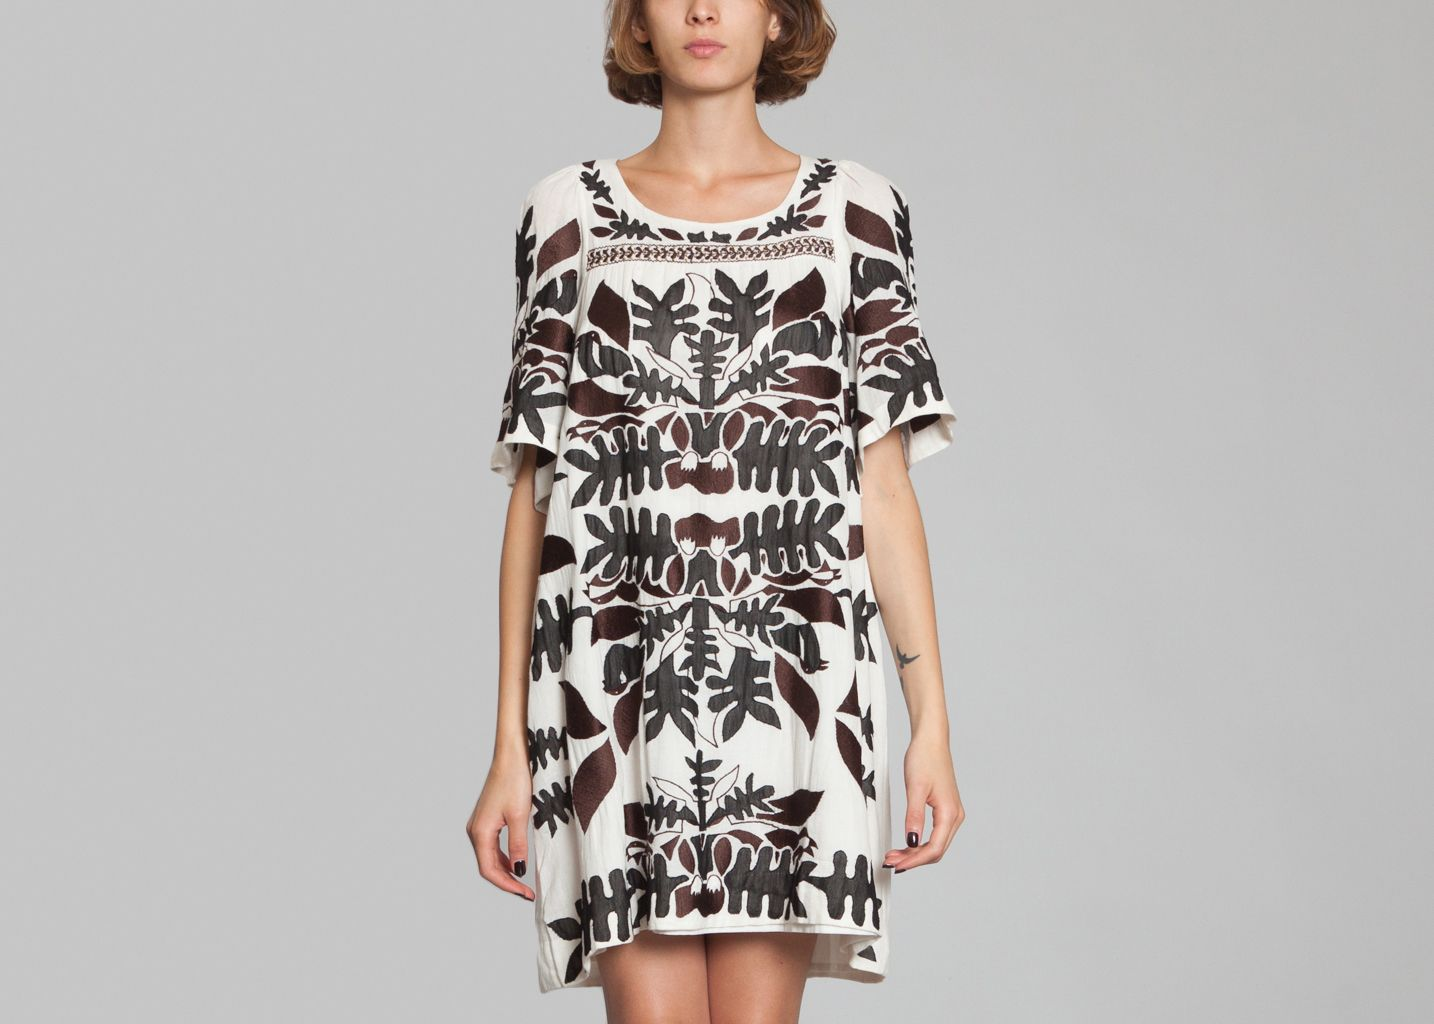 robe aga antik batik cr me l 39 exception. Black Bedroom Furniture Sets. Home Design Ideas